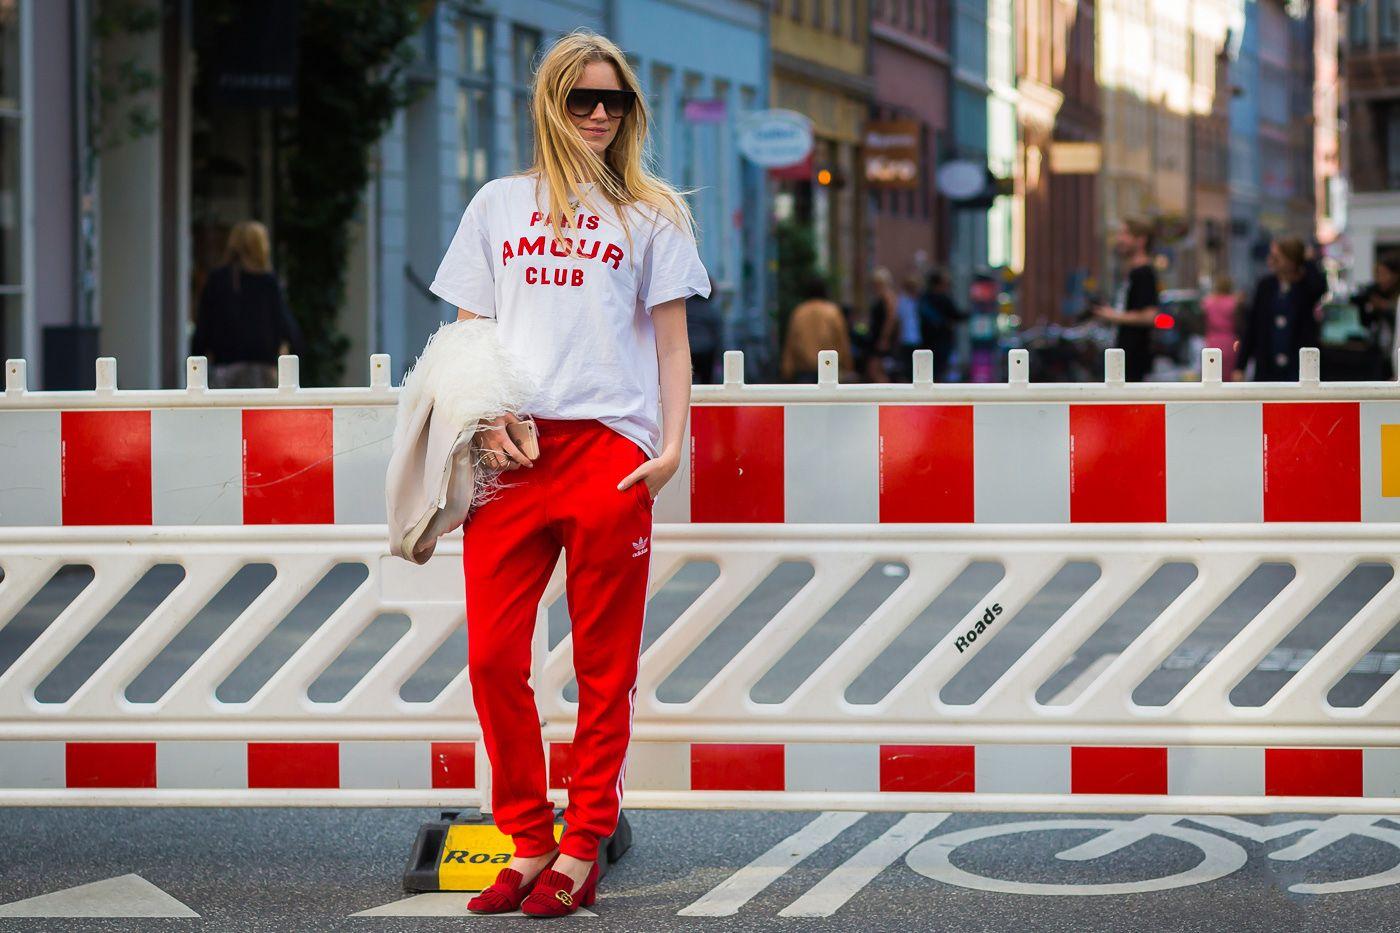 between-shows-by-styledumonde-street-style-fashion-photography0e2a1519-700x4672x-2fd47fa6b0f77814969cf3a2c14fa85c.jpg